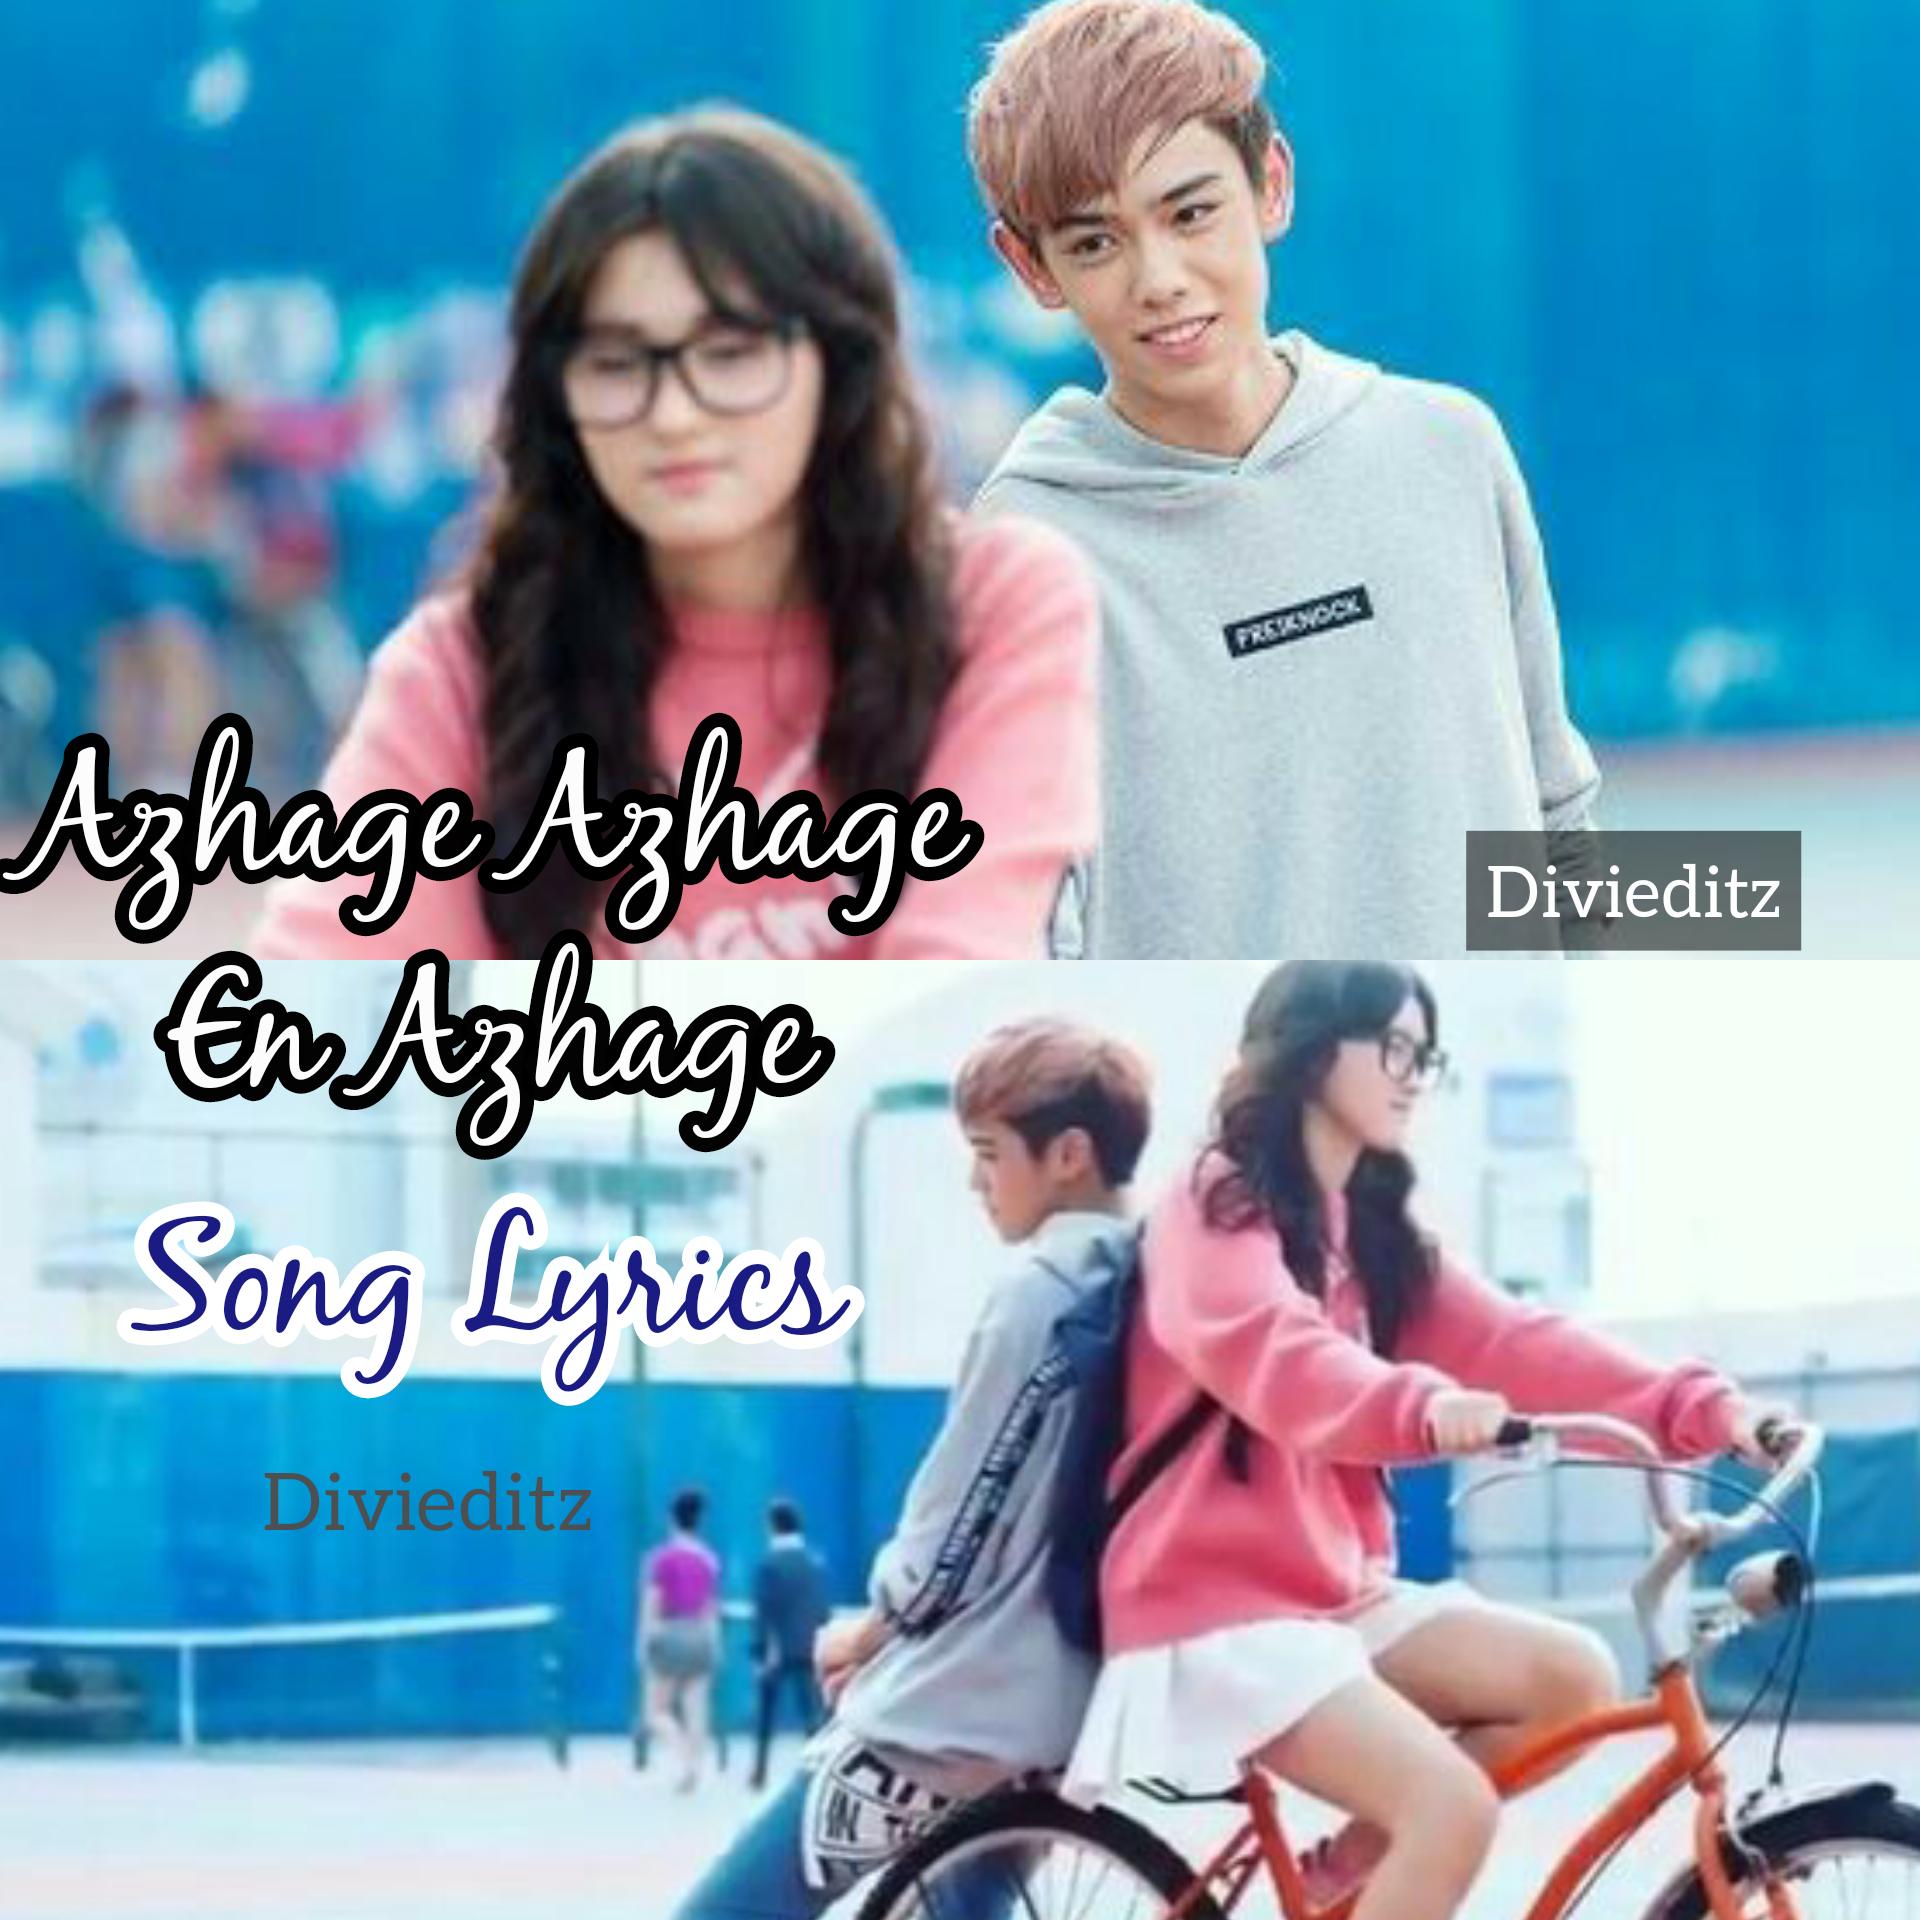 Azhage Azhage En Azhage Album Song Lyrics